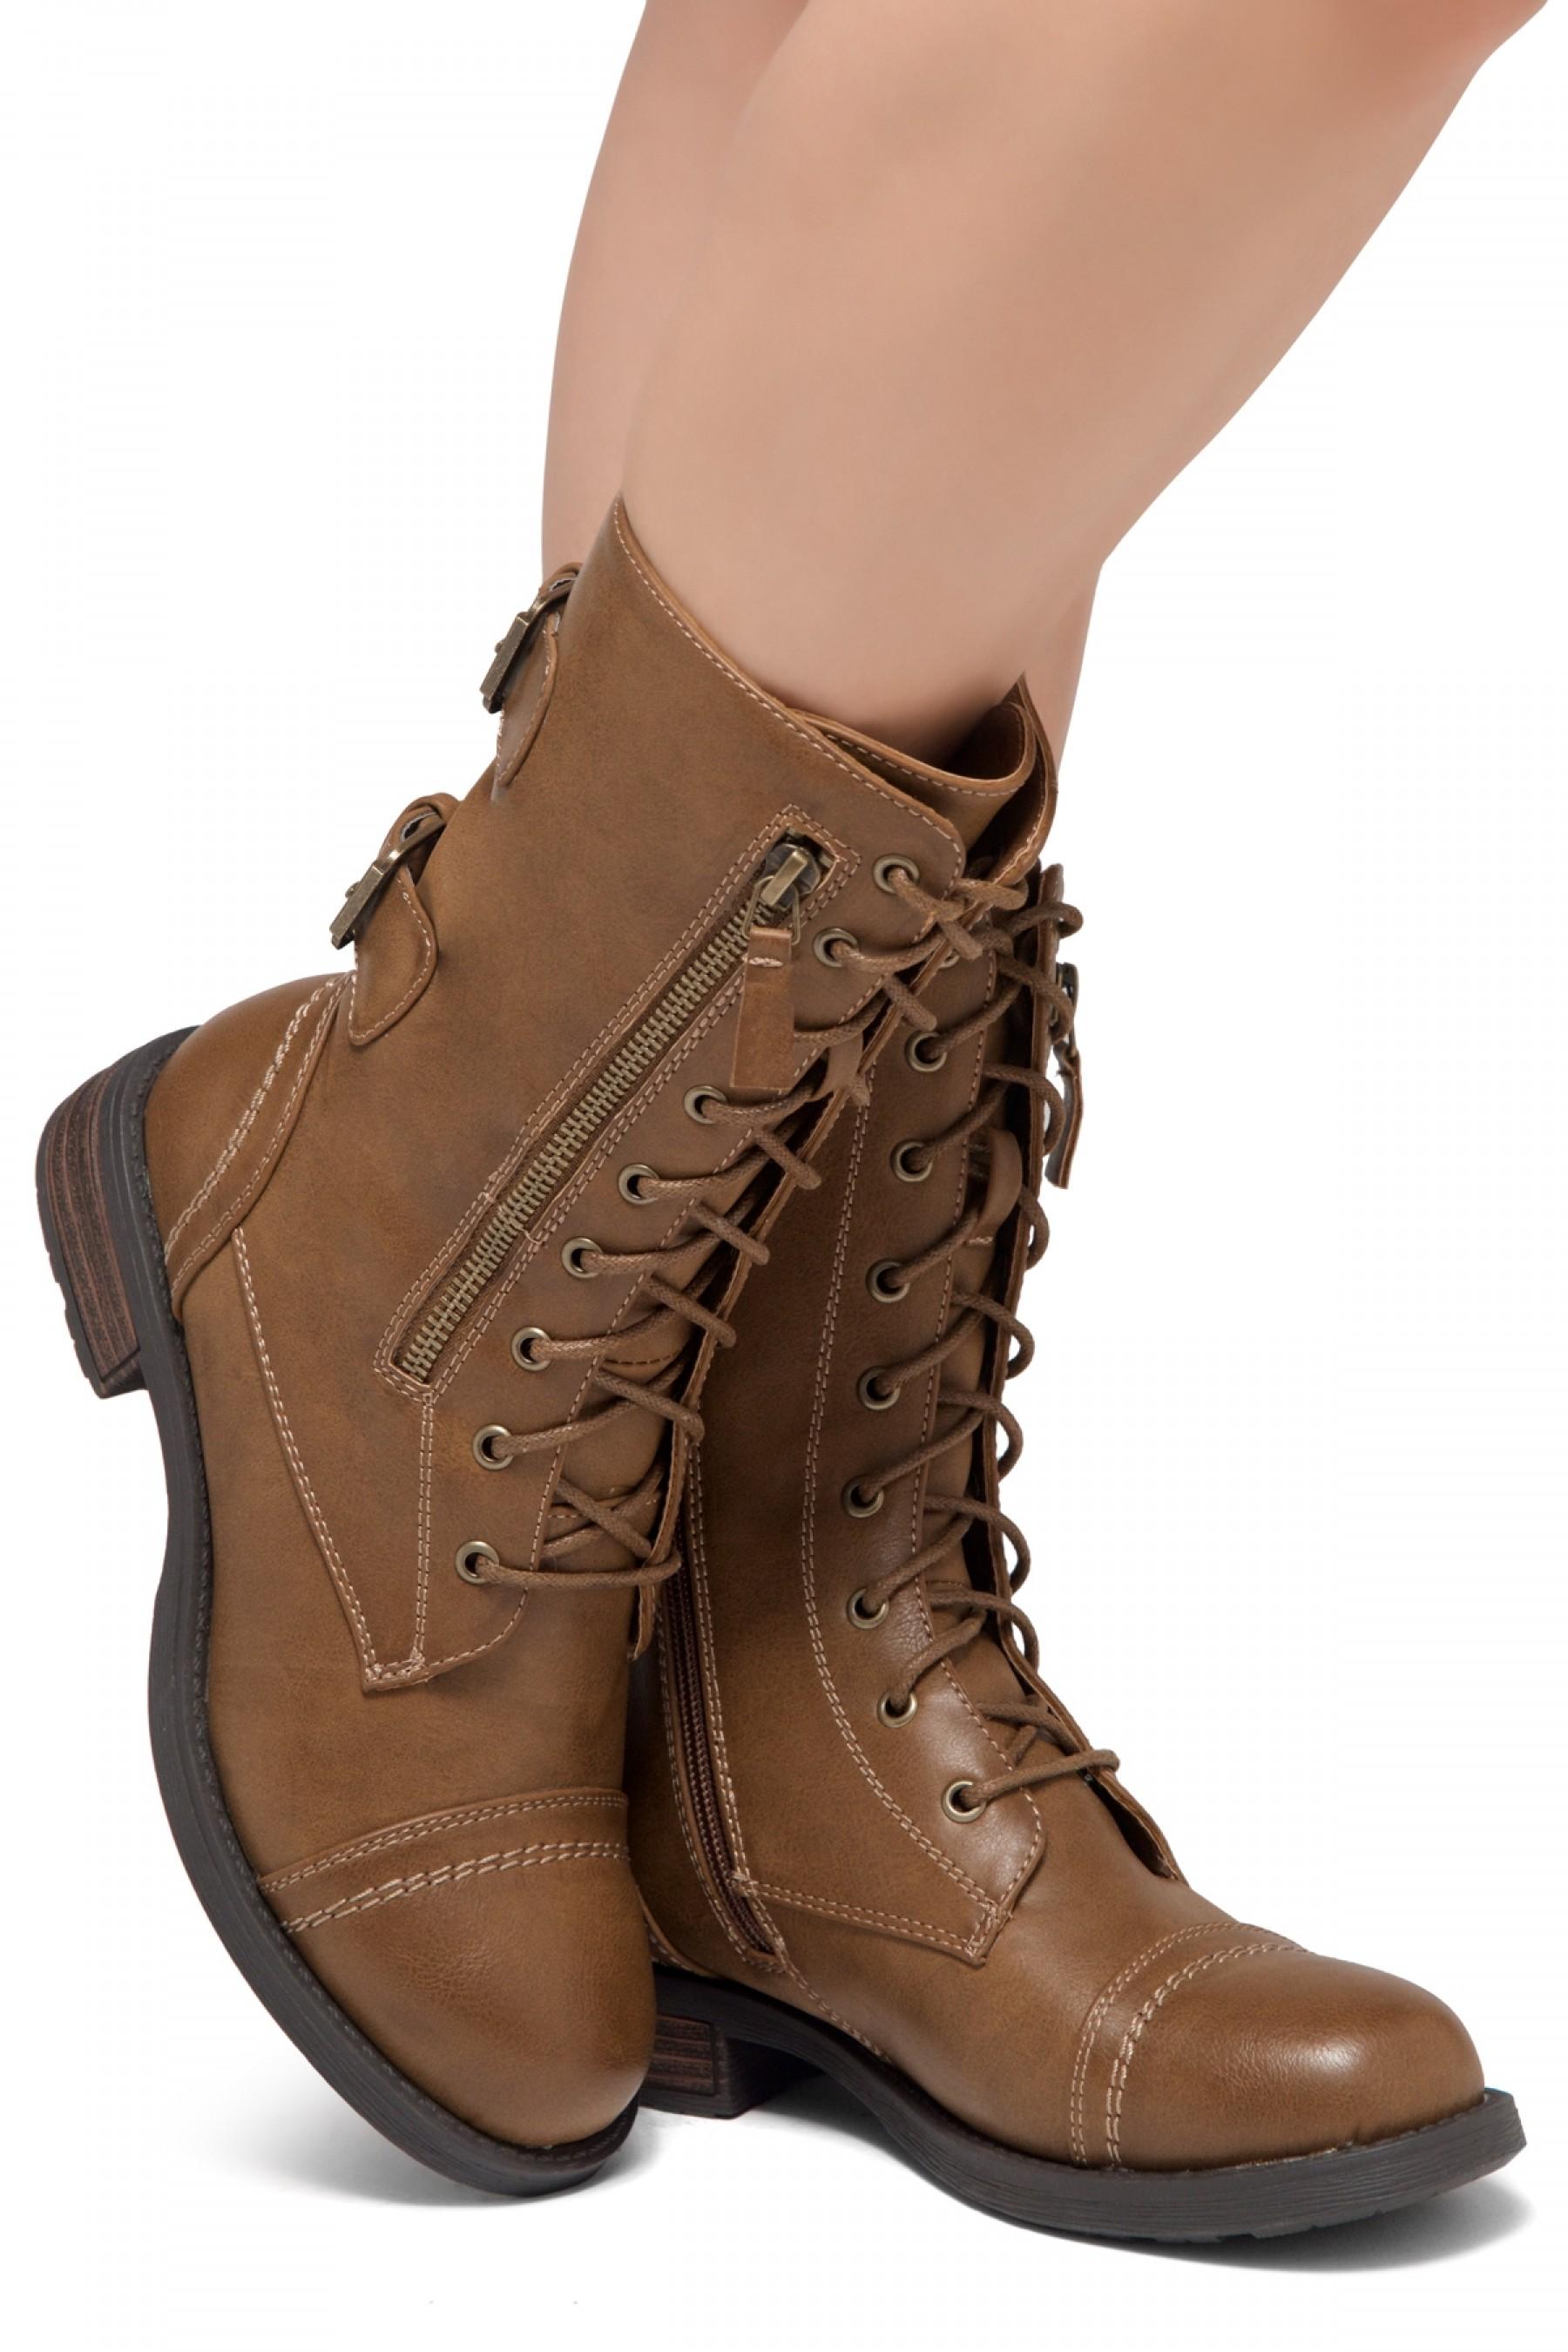 ShoeLand KASEY-Women's Military Lace Up